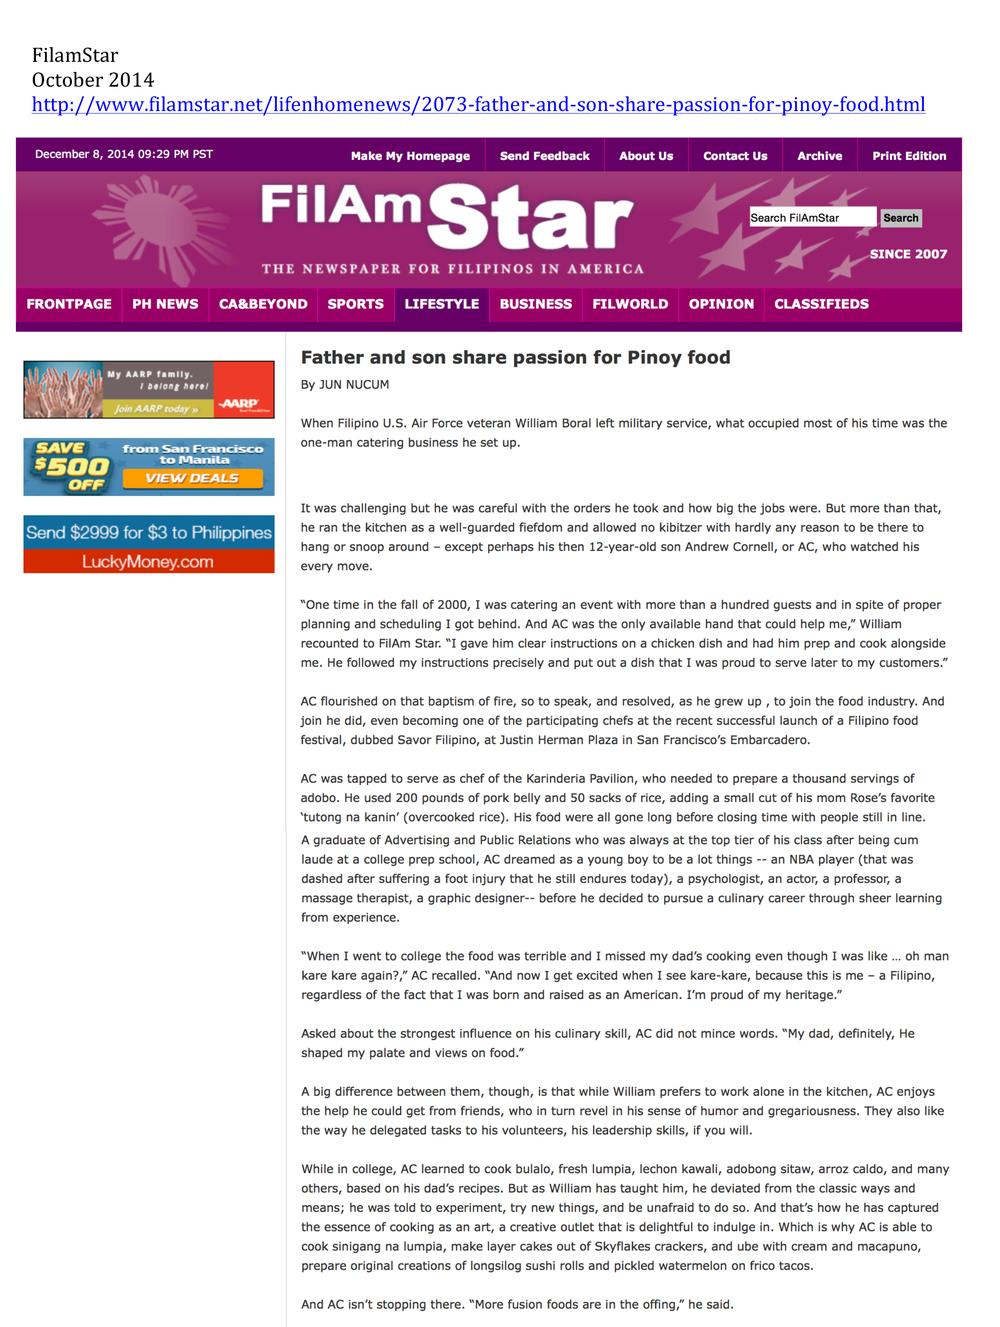 FilAm Star AC Boral